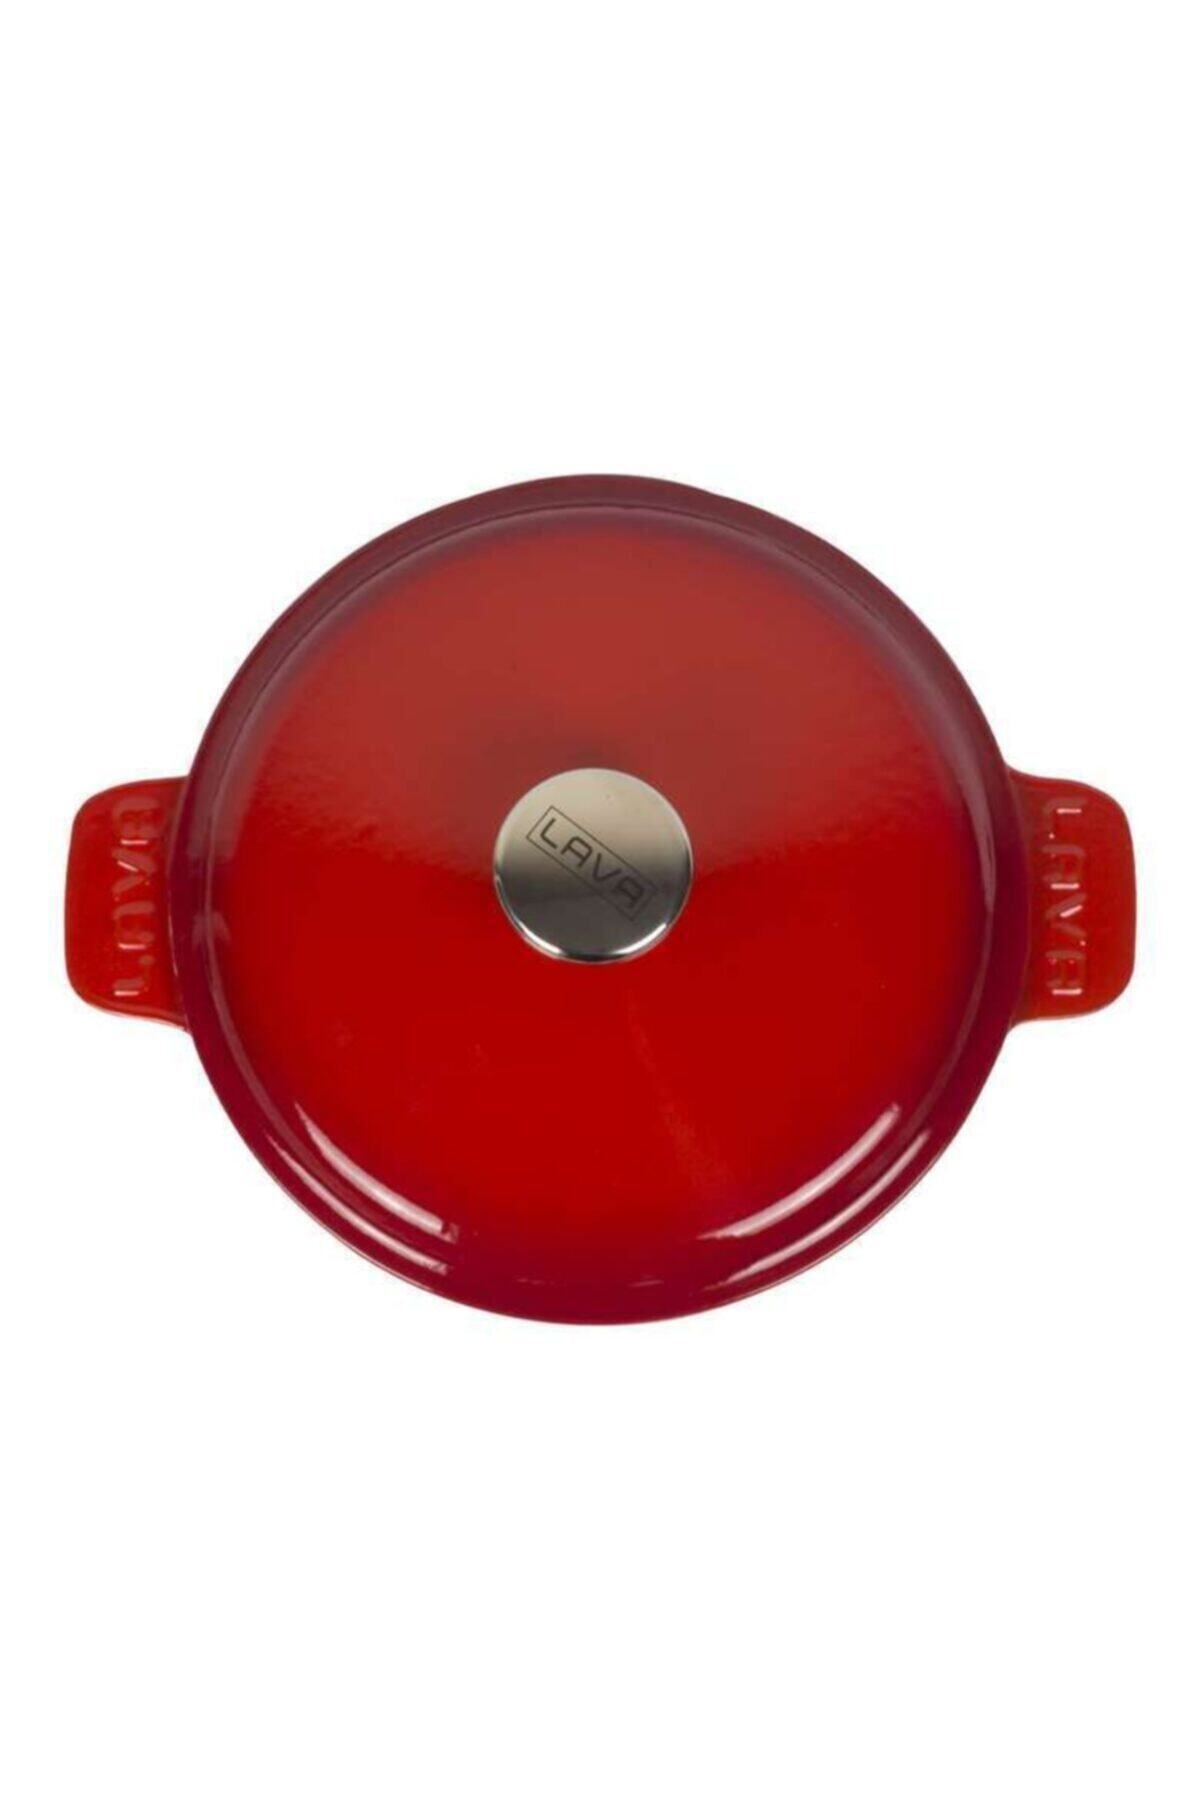 Lava Kırmızı Yuvarlak Tencere Çap 26 Cm 1